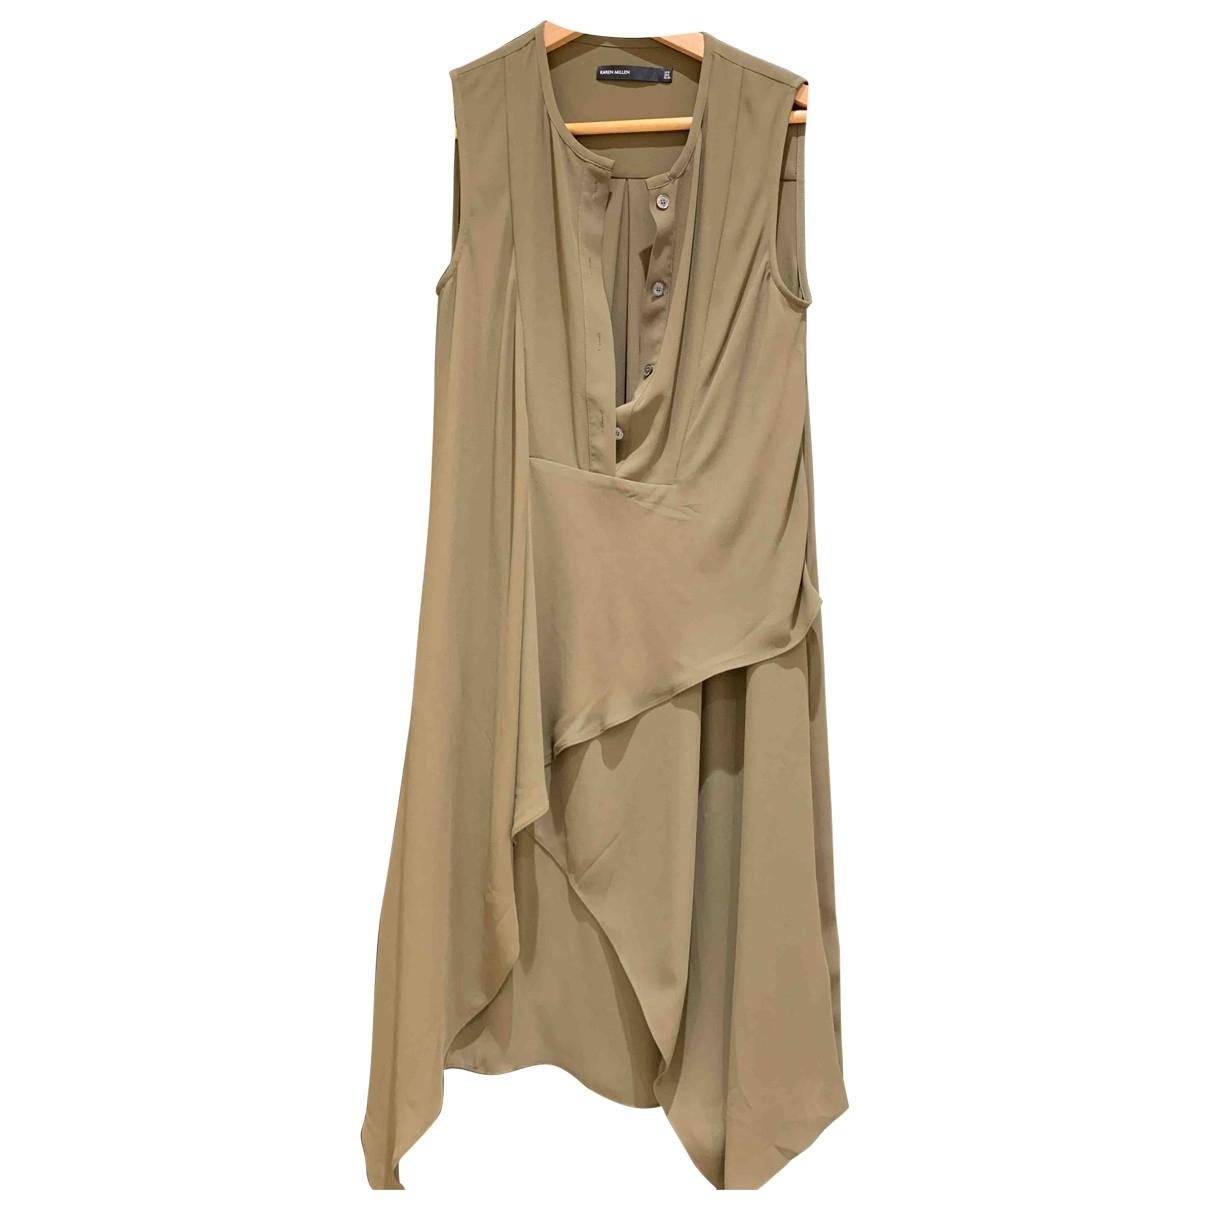 Karen Millen \N Khaki dress for Women 6 UK